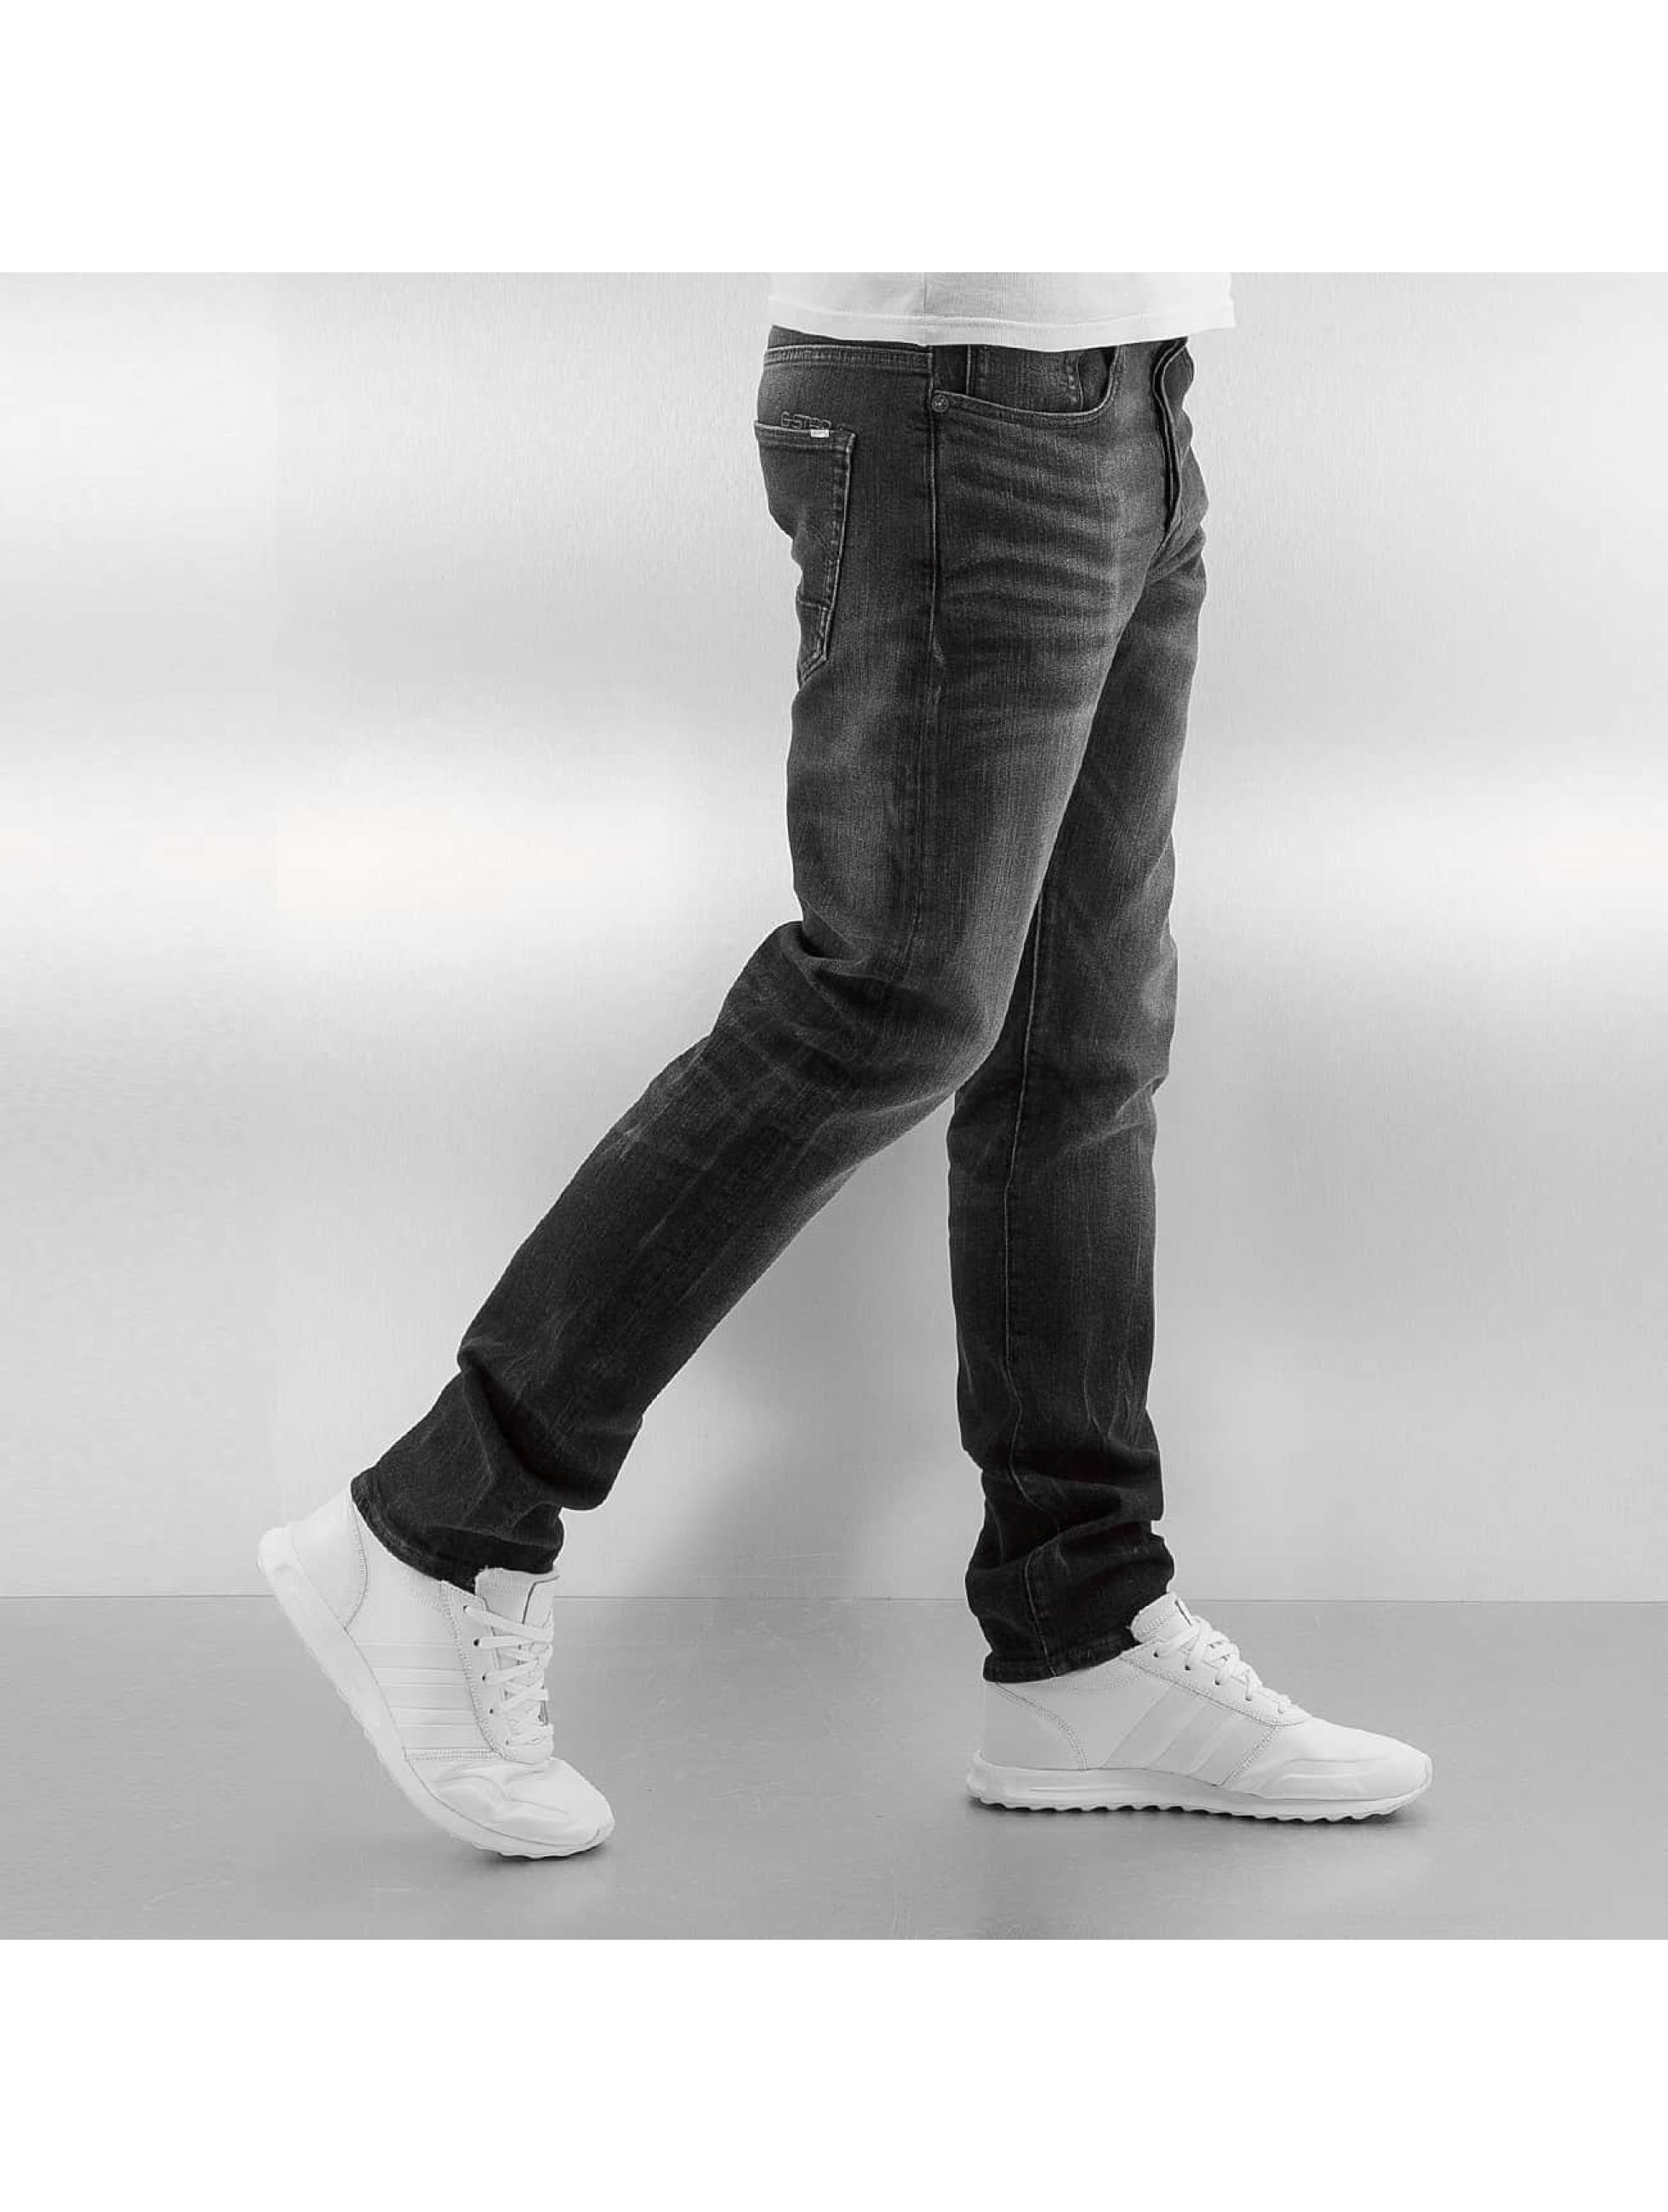 G-Star Tynne bukser 3301 Slim Skop Black Strech Denim grå